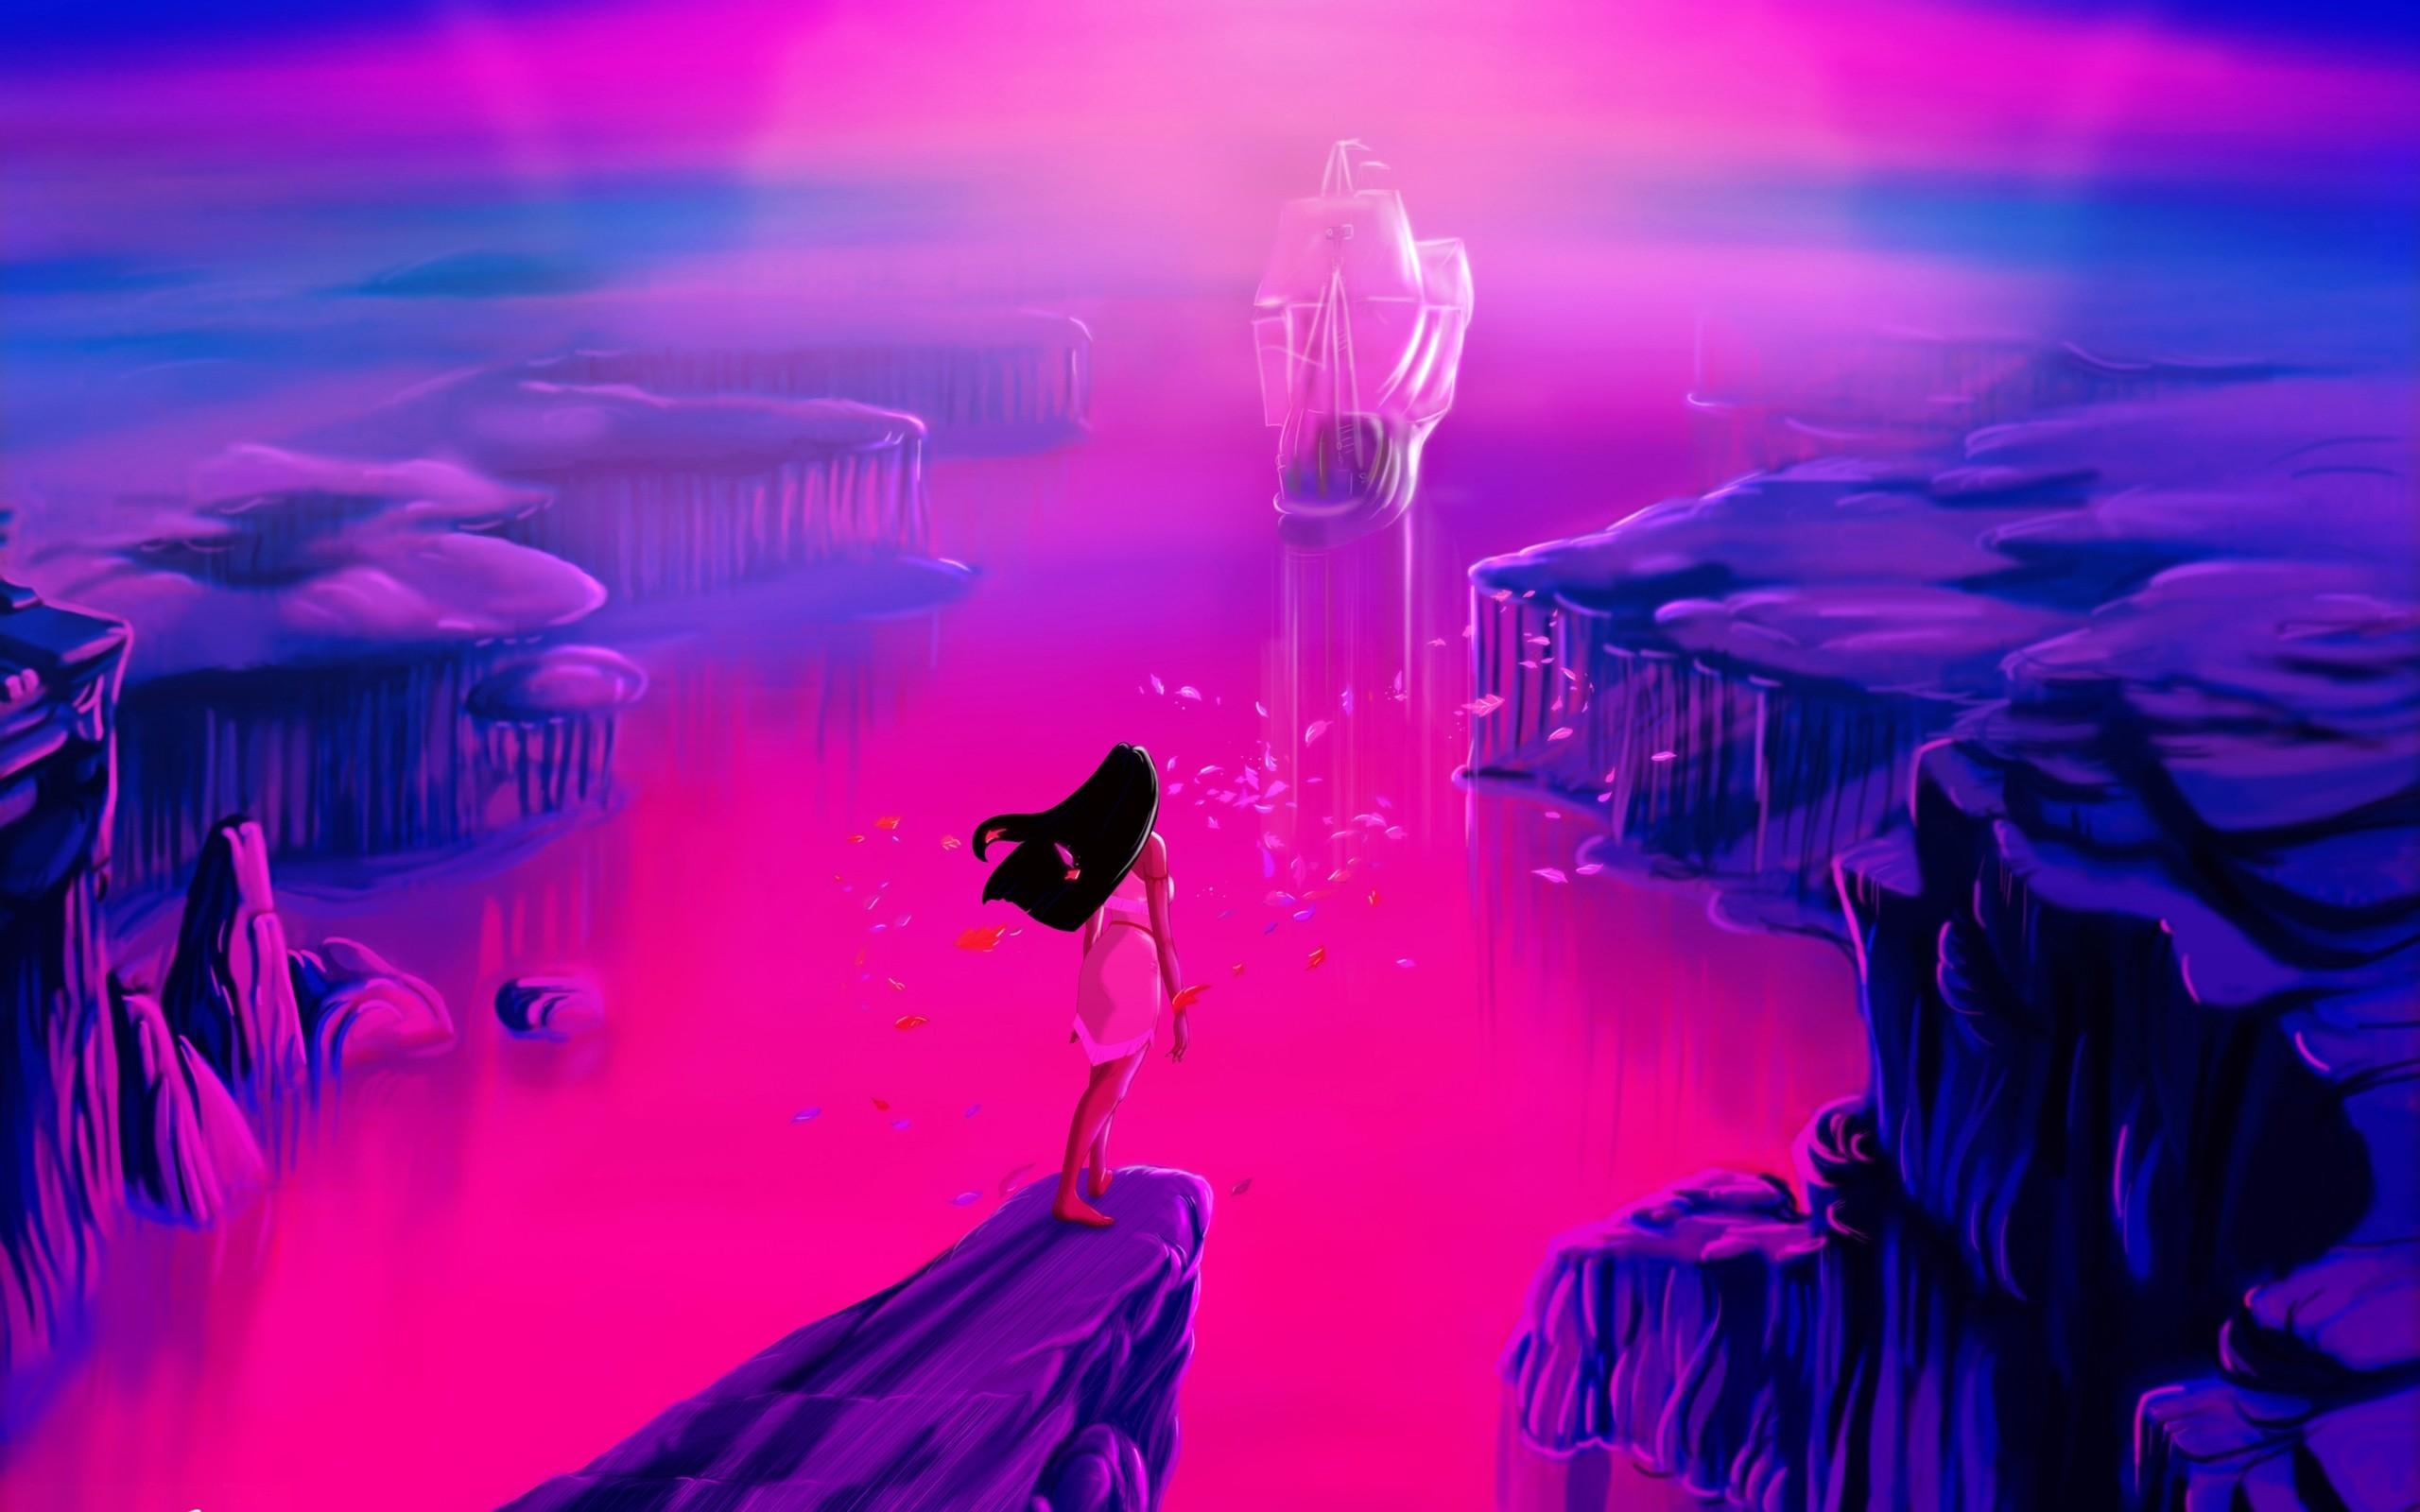 Res: 2560x1600, Pocahontas HD Wallpaper | Hintergrund |  | ID:392231 - Wallpaper  Abyss